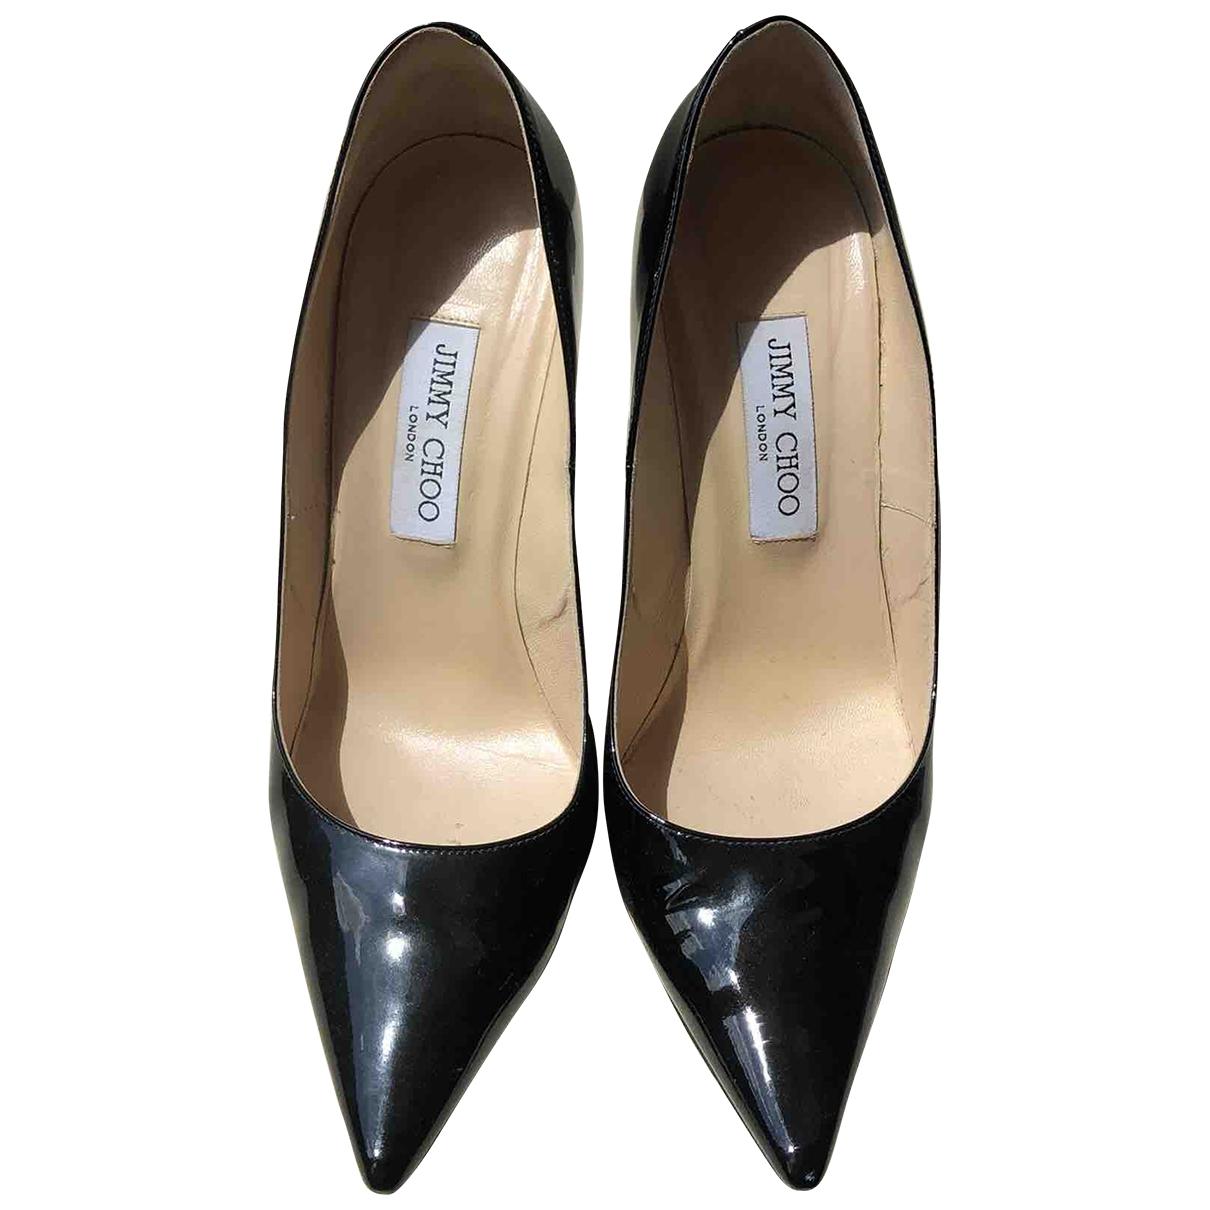 Jimmy Choo Anouk Black Leather Heels for Women 39.5 EU